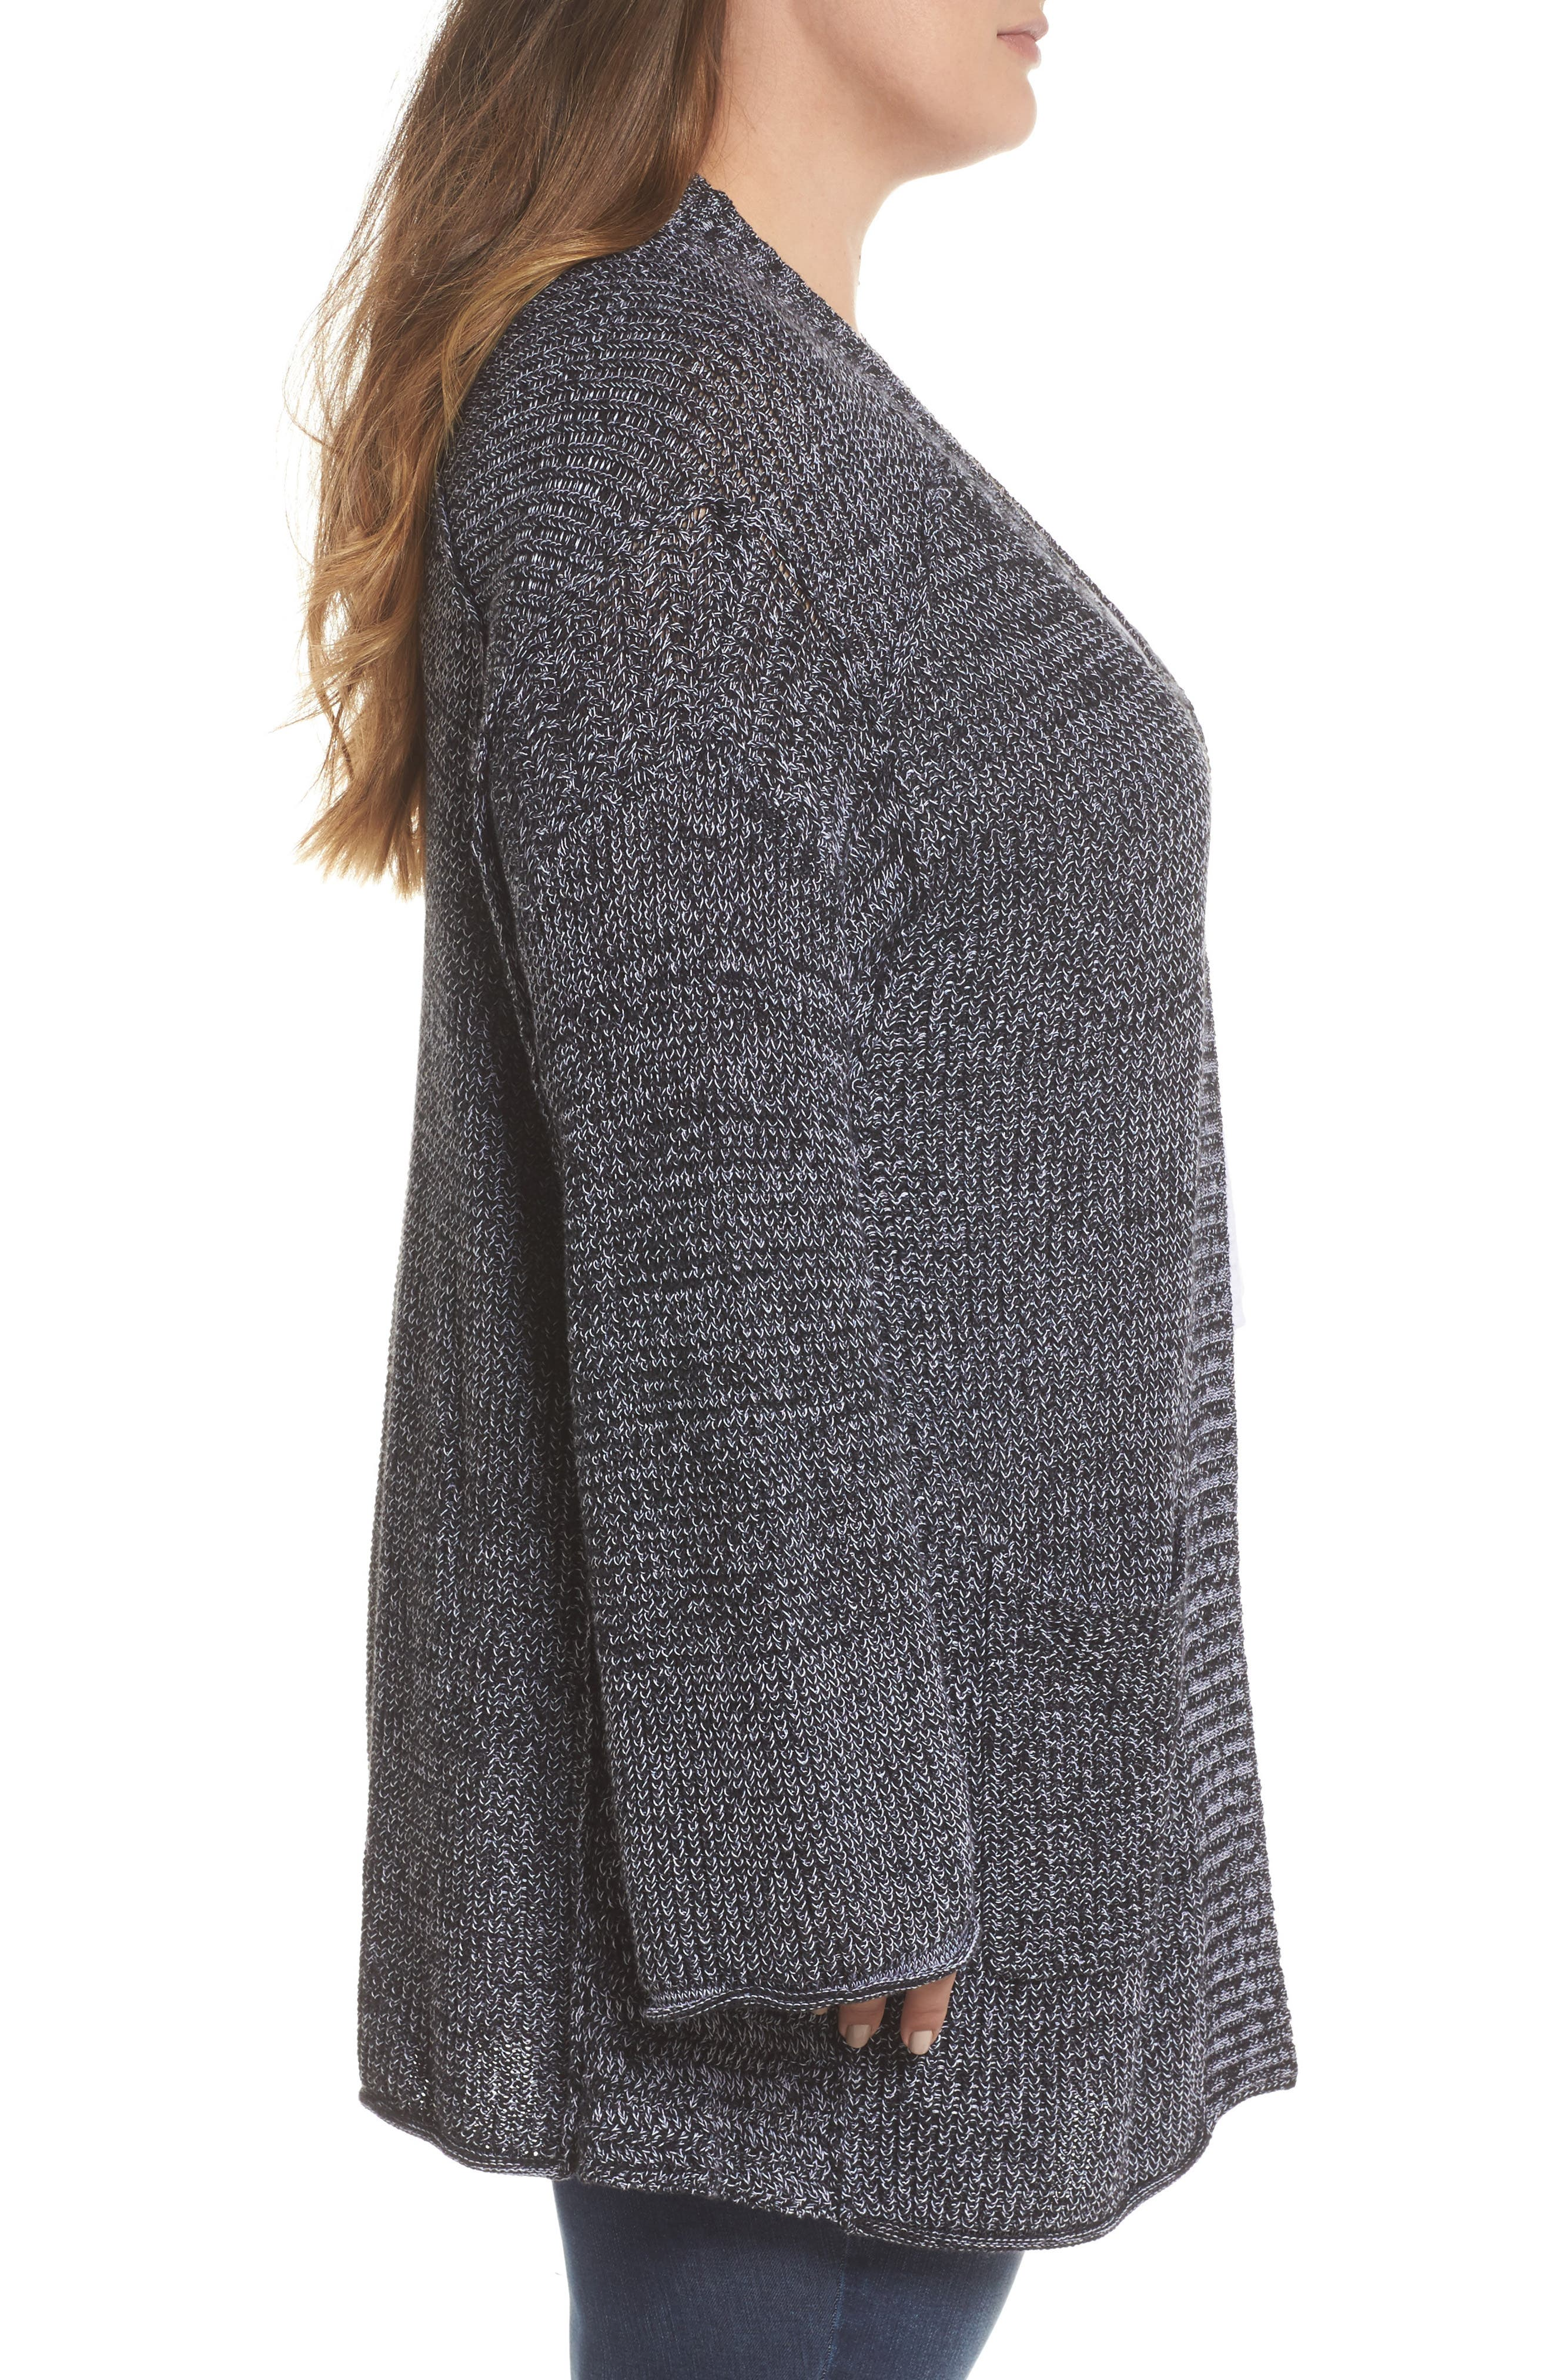 Sweater Knit Cardigan,                             Alternate thumbnail 3, color,                             001